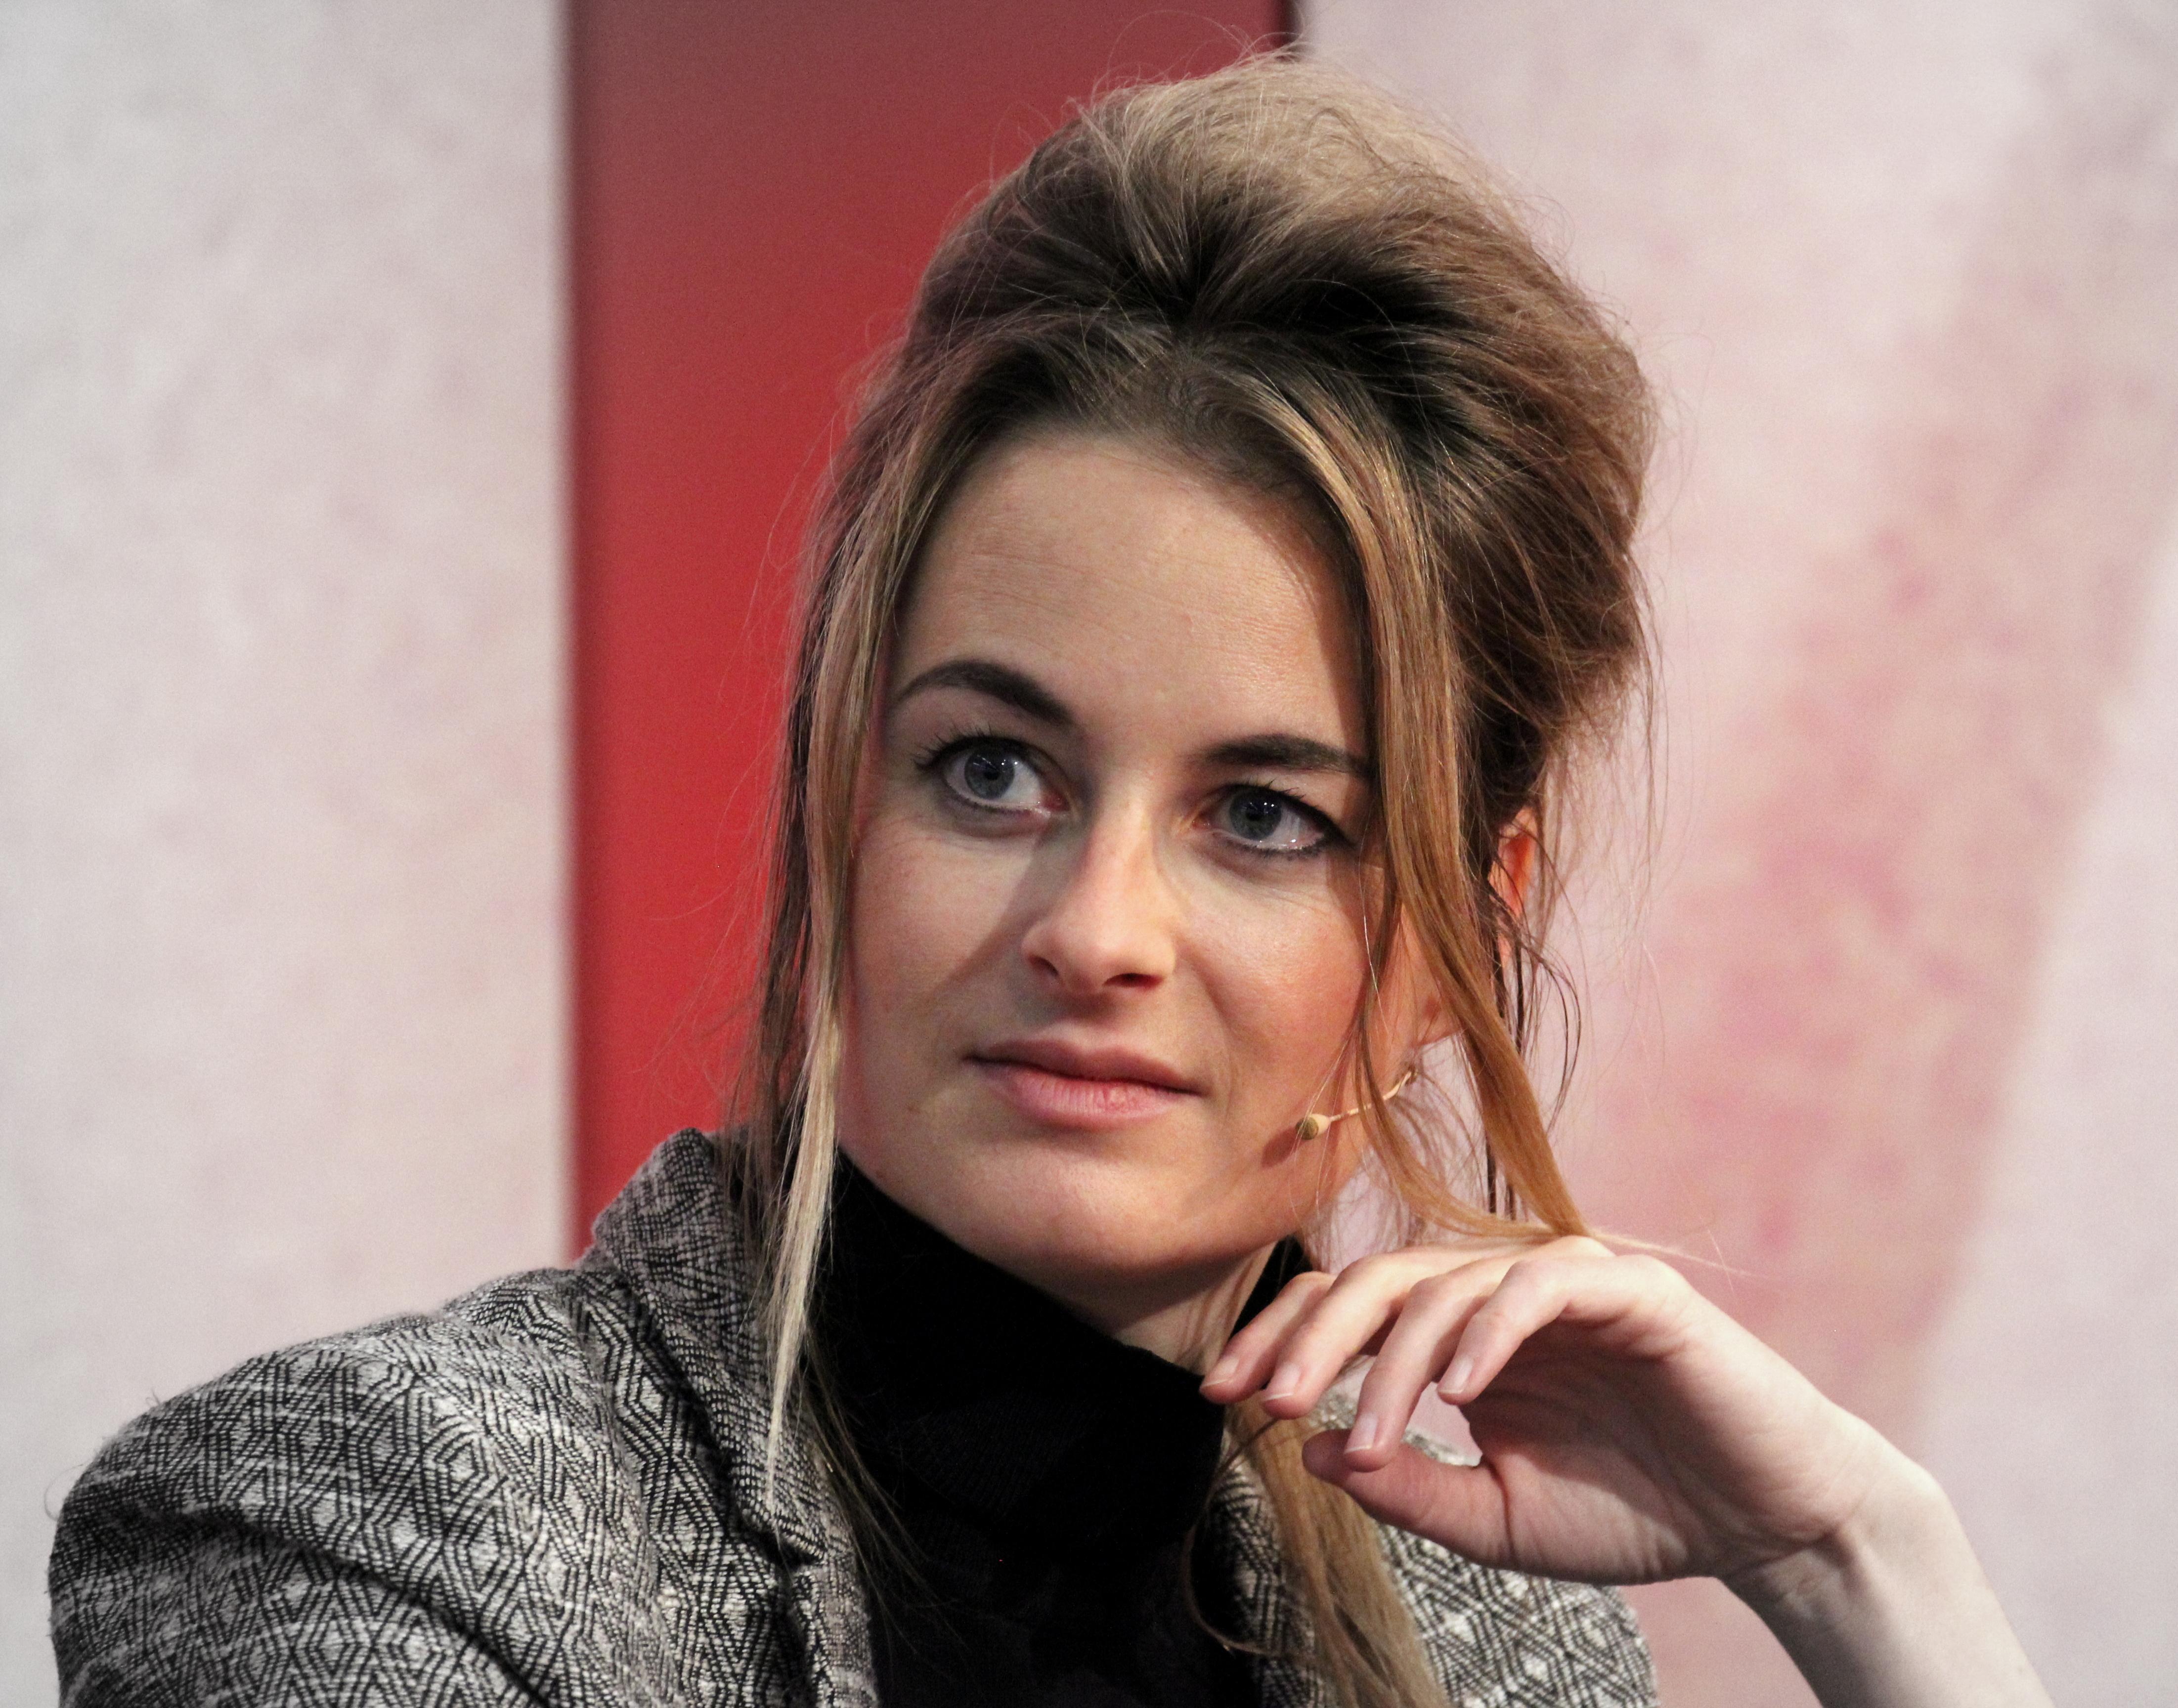 Teresa Präauer (c) Heike_Huslage-Koch